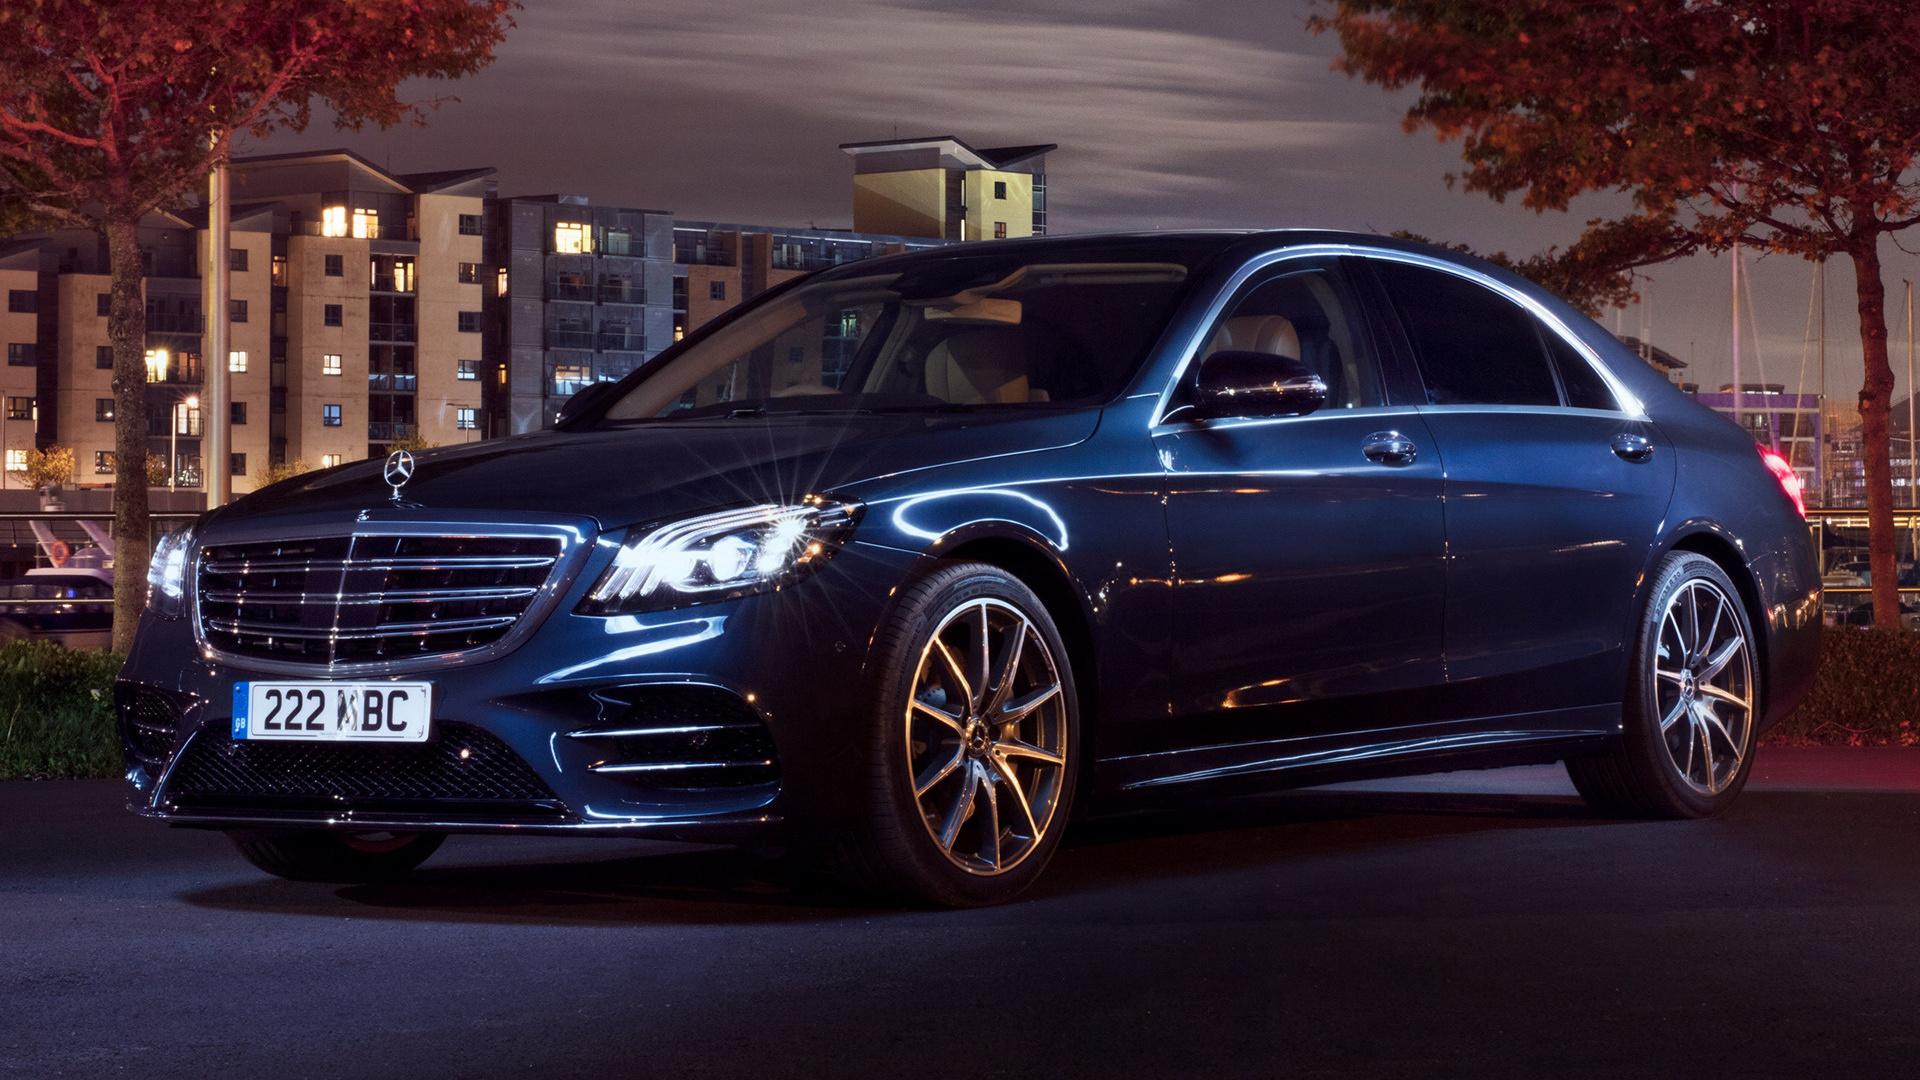 2017 Mercedes Benz S Class Amg Line Long Uk Fondos De